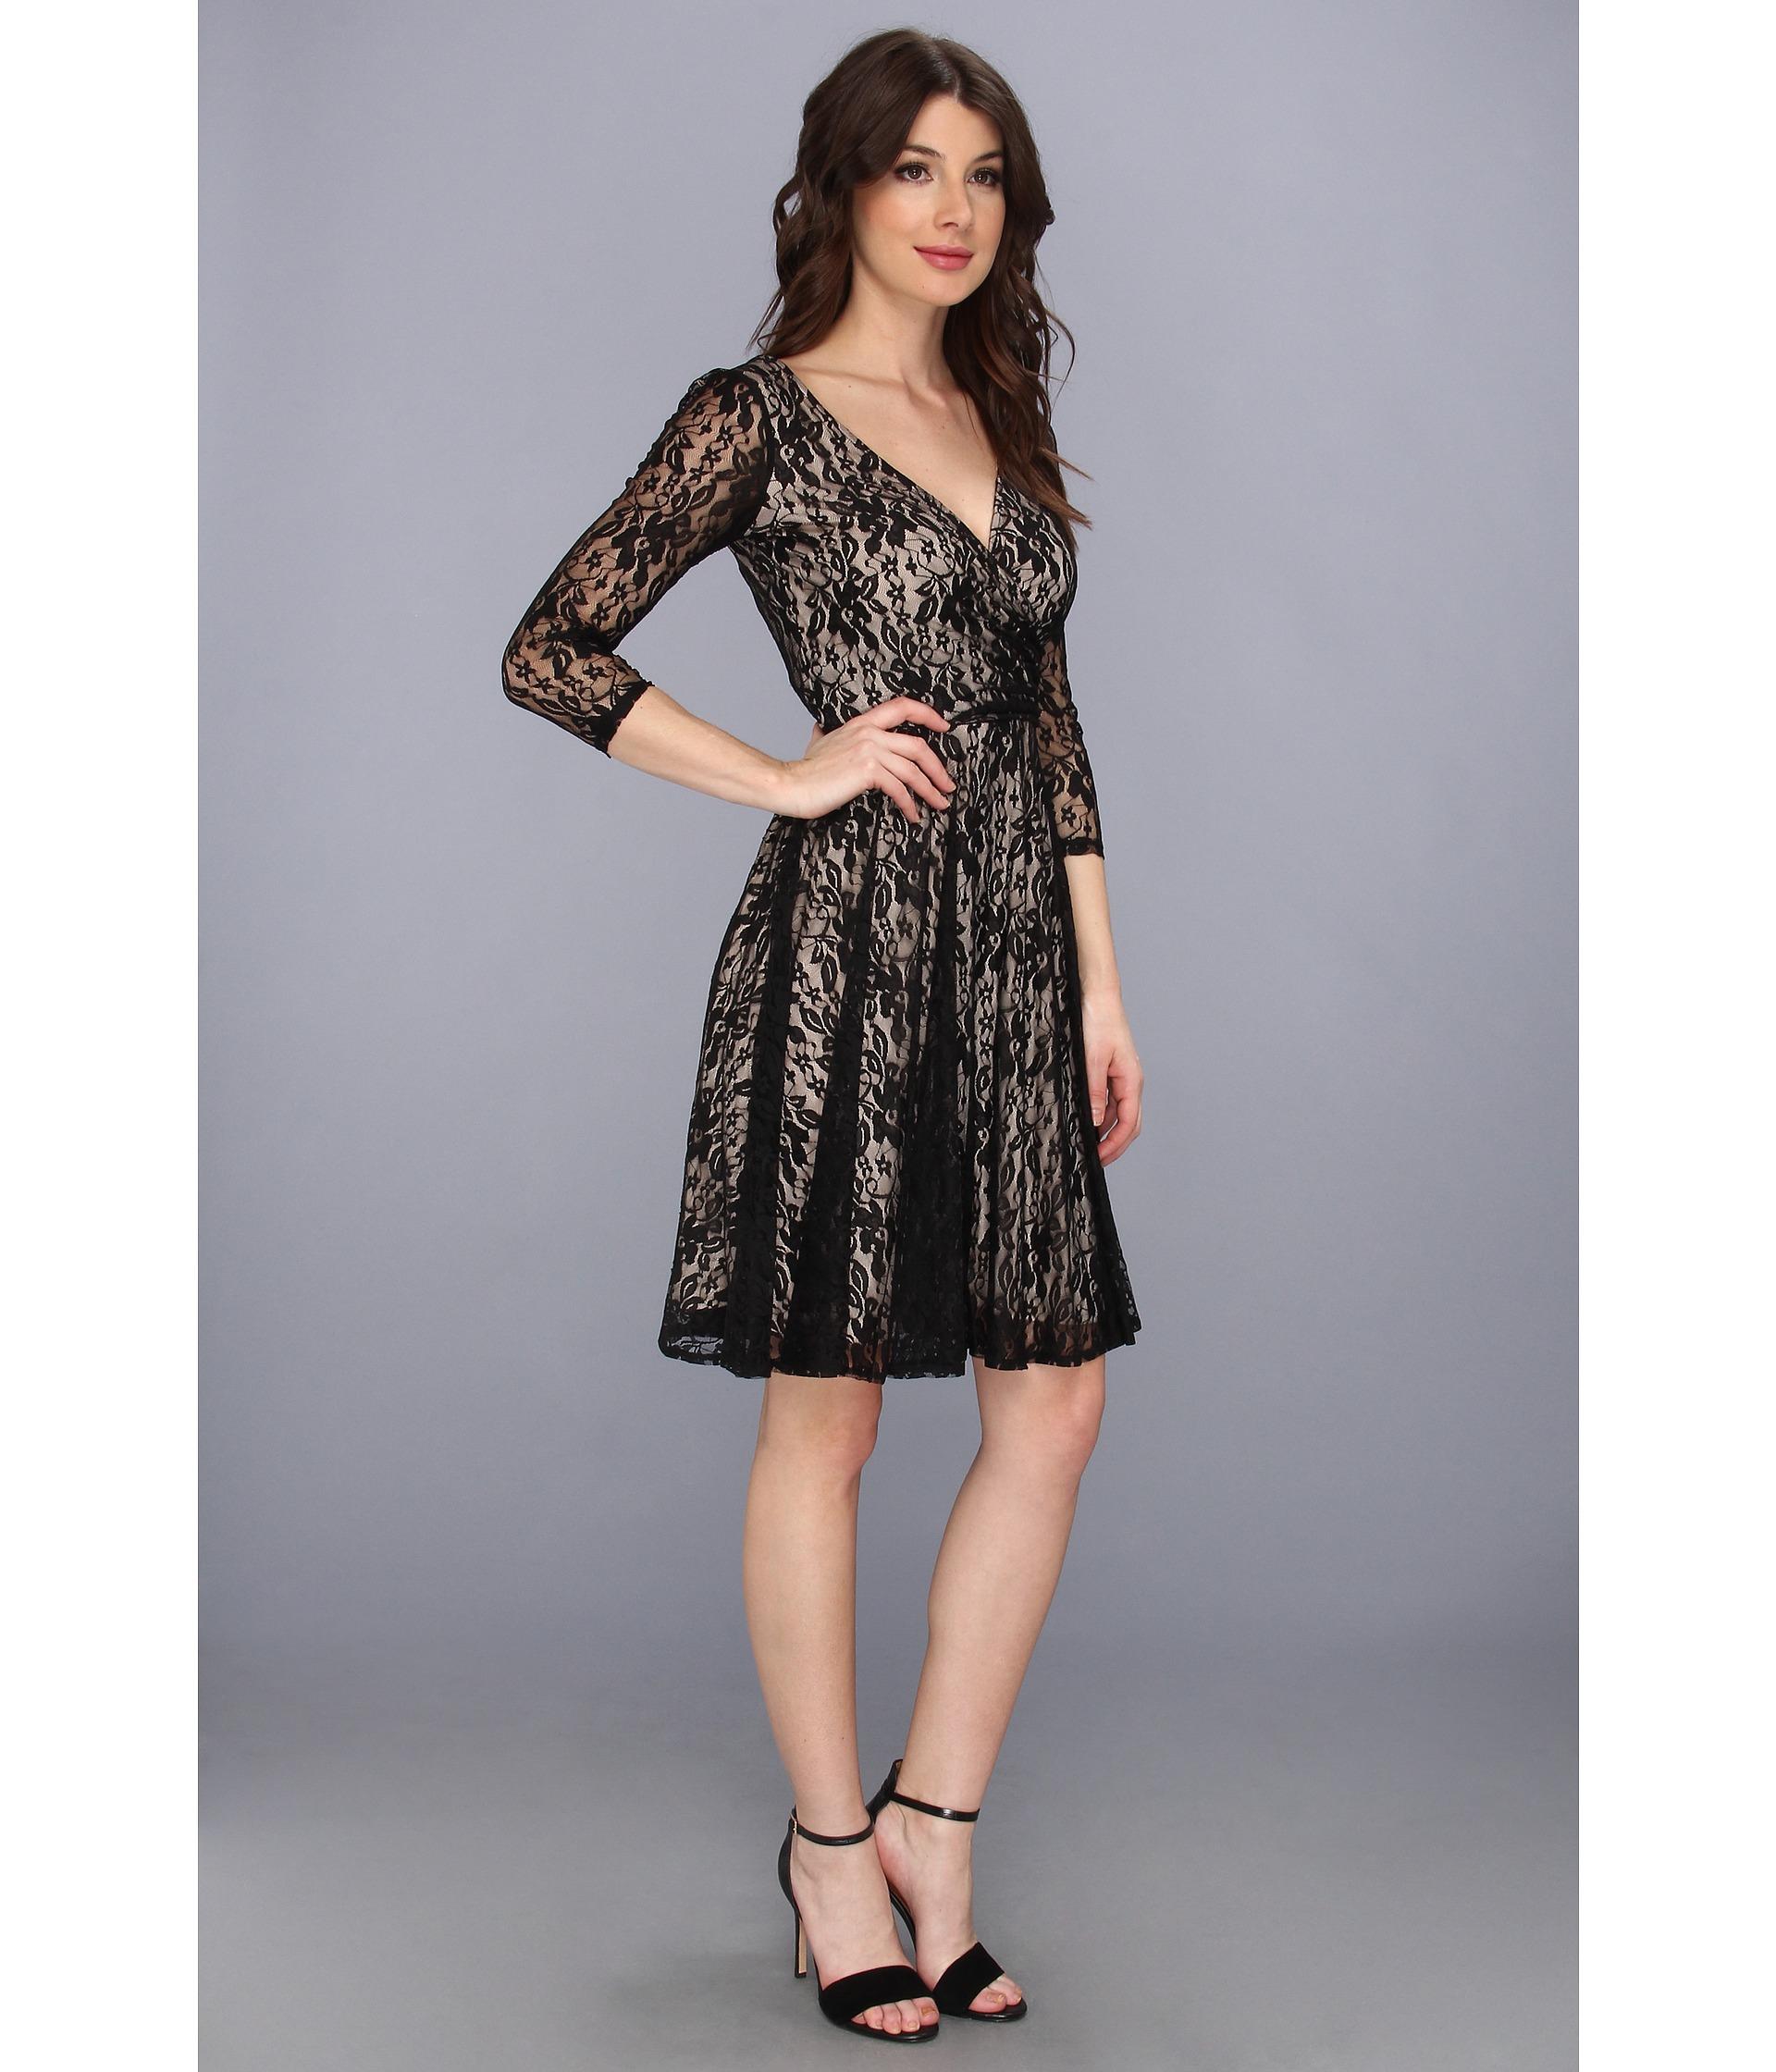 Stretch Lace Dress - Dress